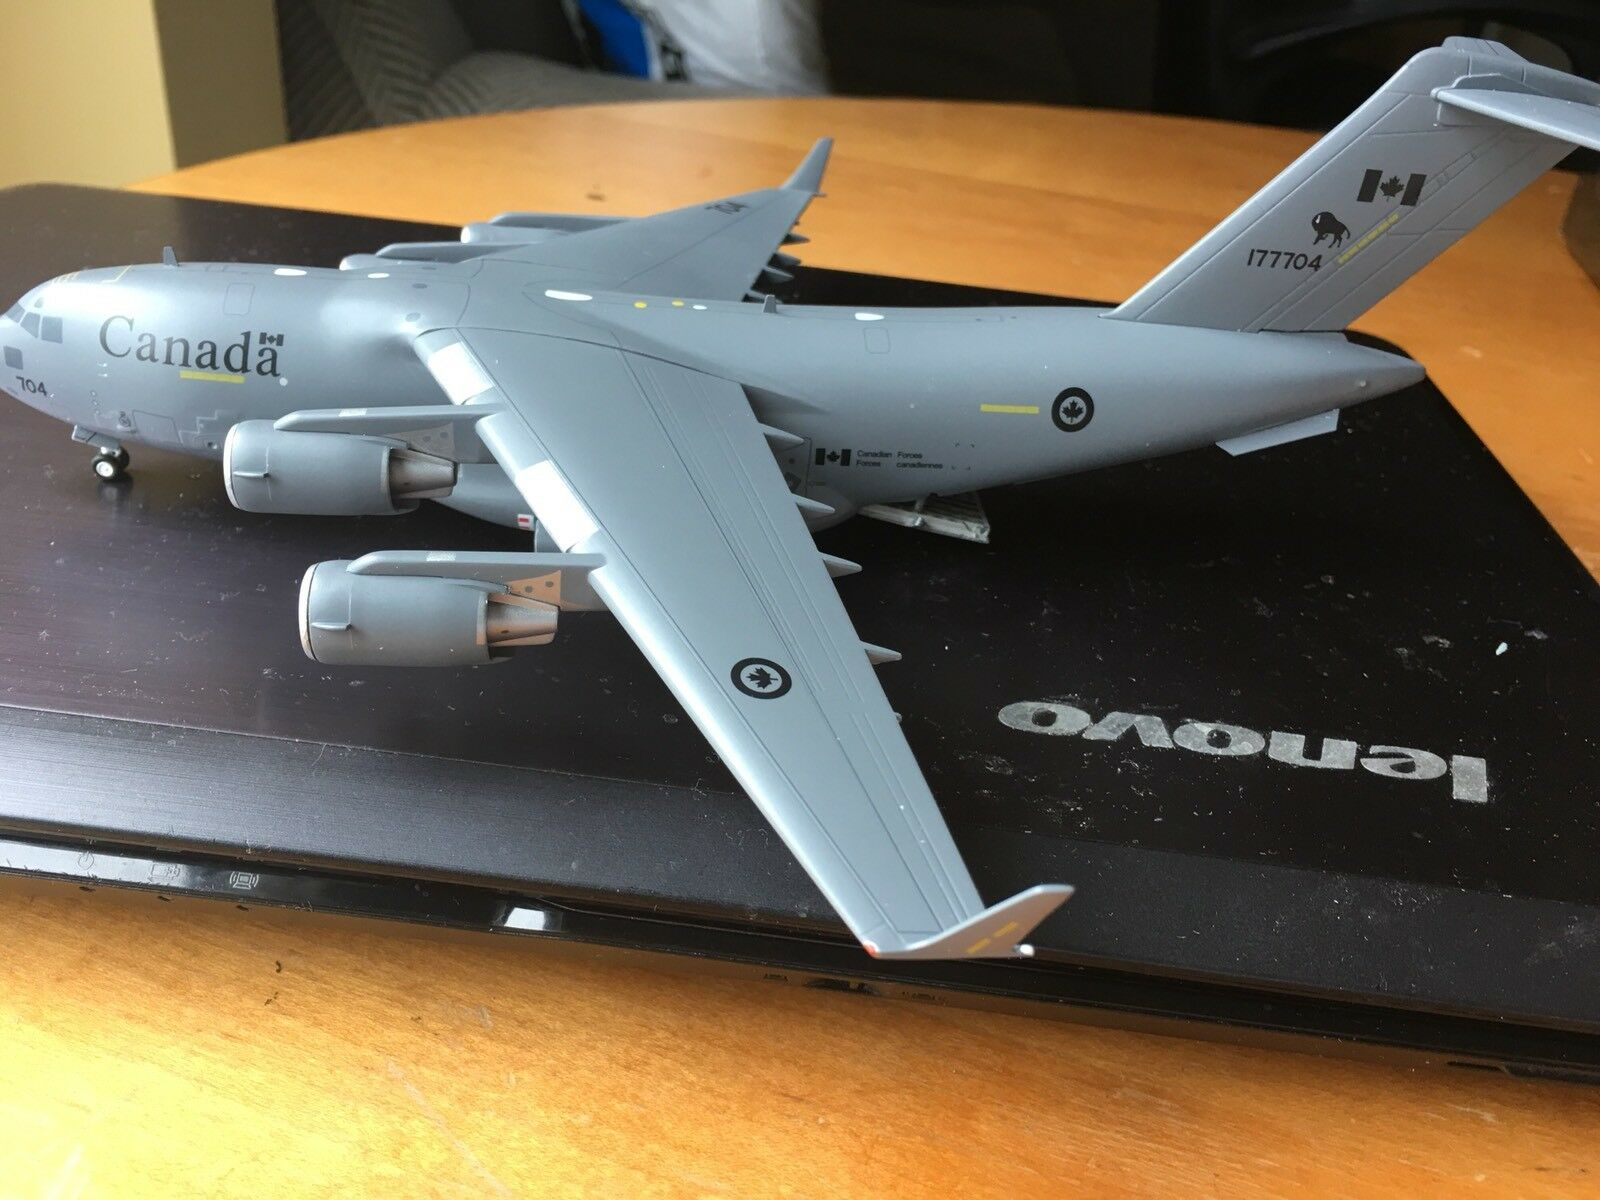 Gemini Jets  C-17 (Canadian) Air Force) 1 200 die cast